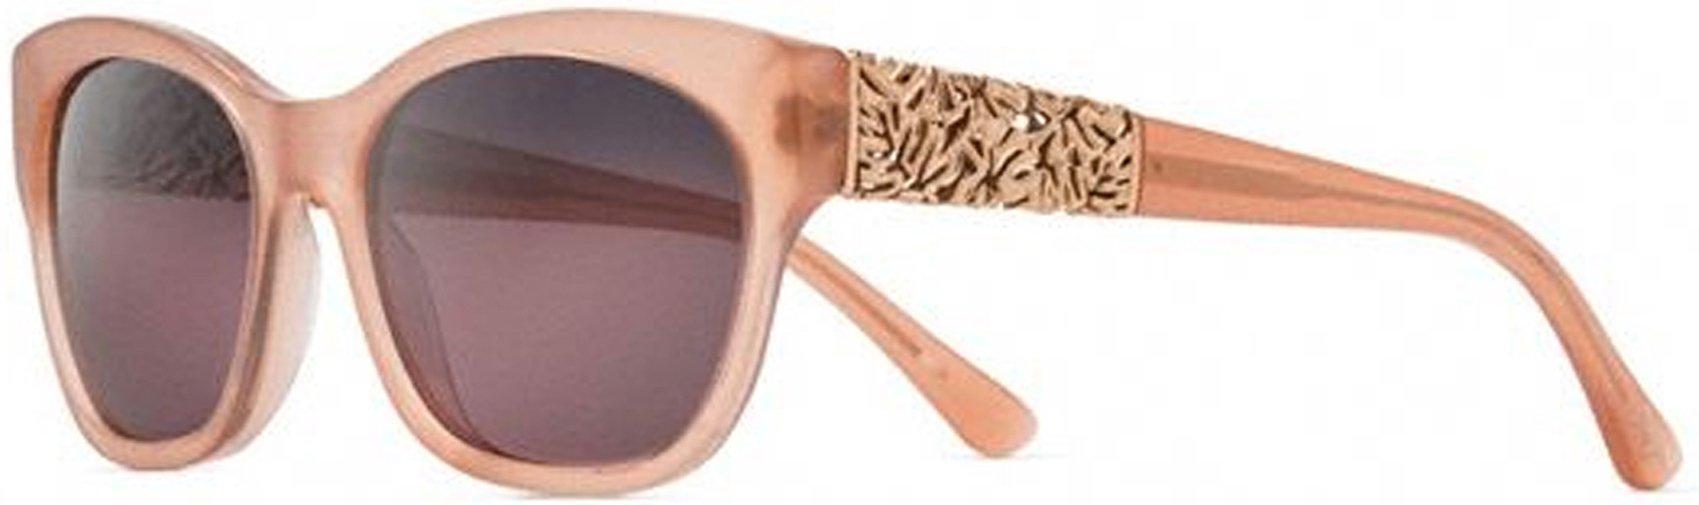 Maui Jim Womens Sunglasses Pink/Pink Acetate - Polarized - 56mm